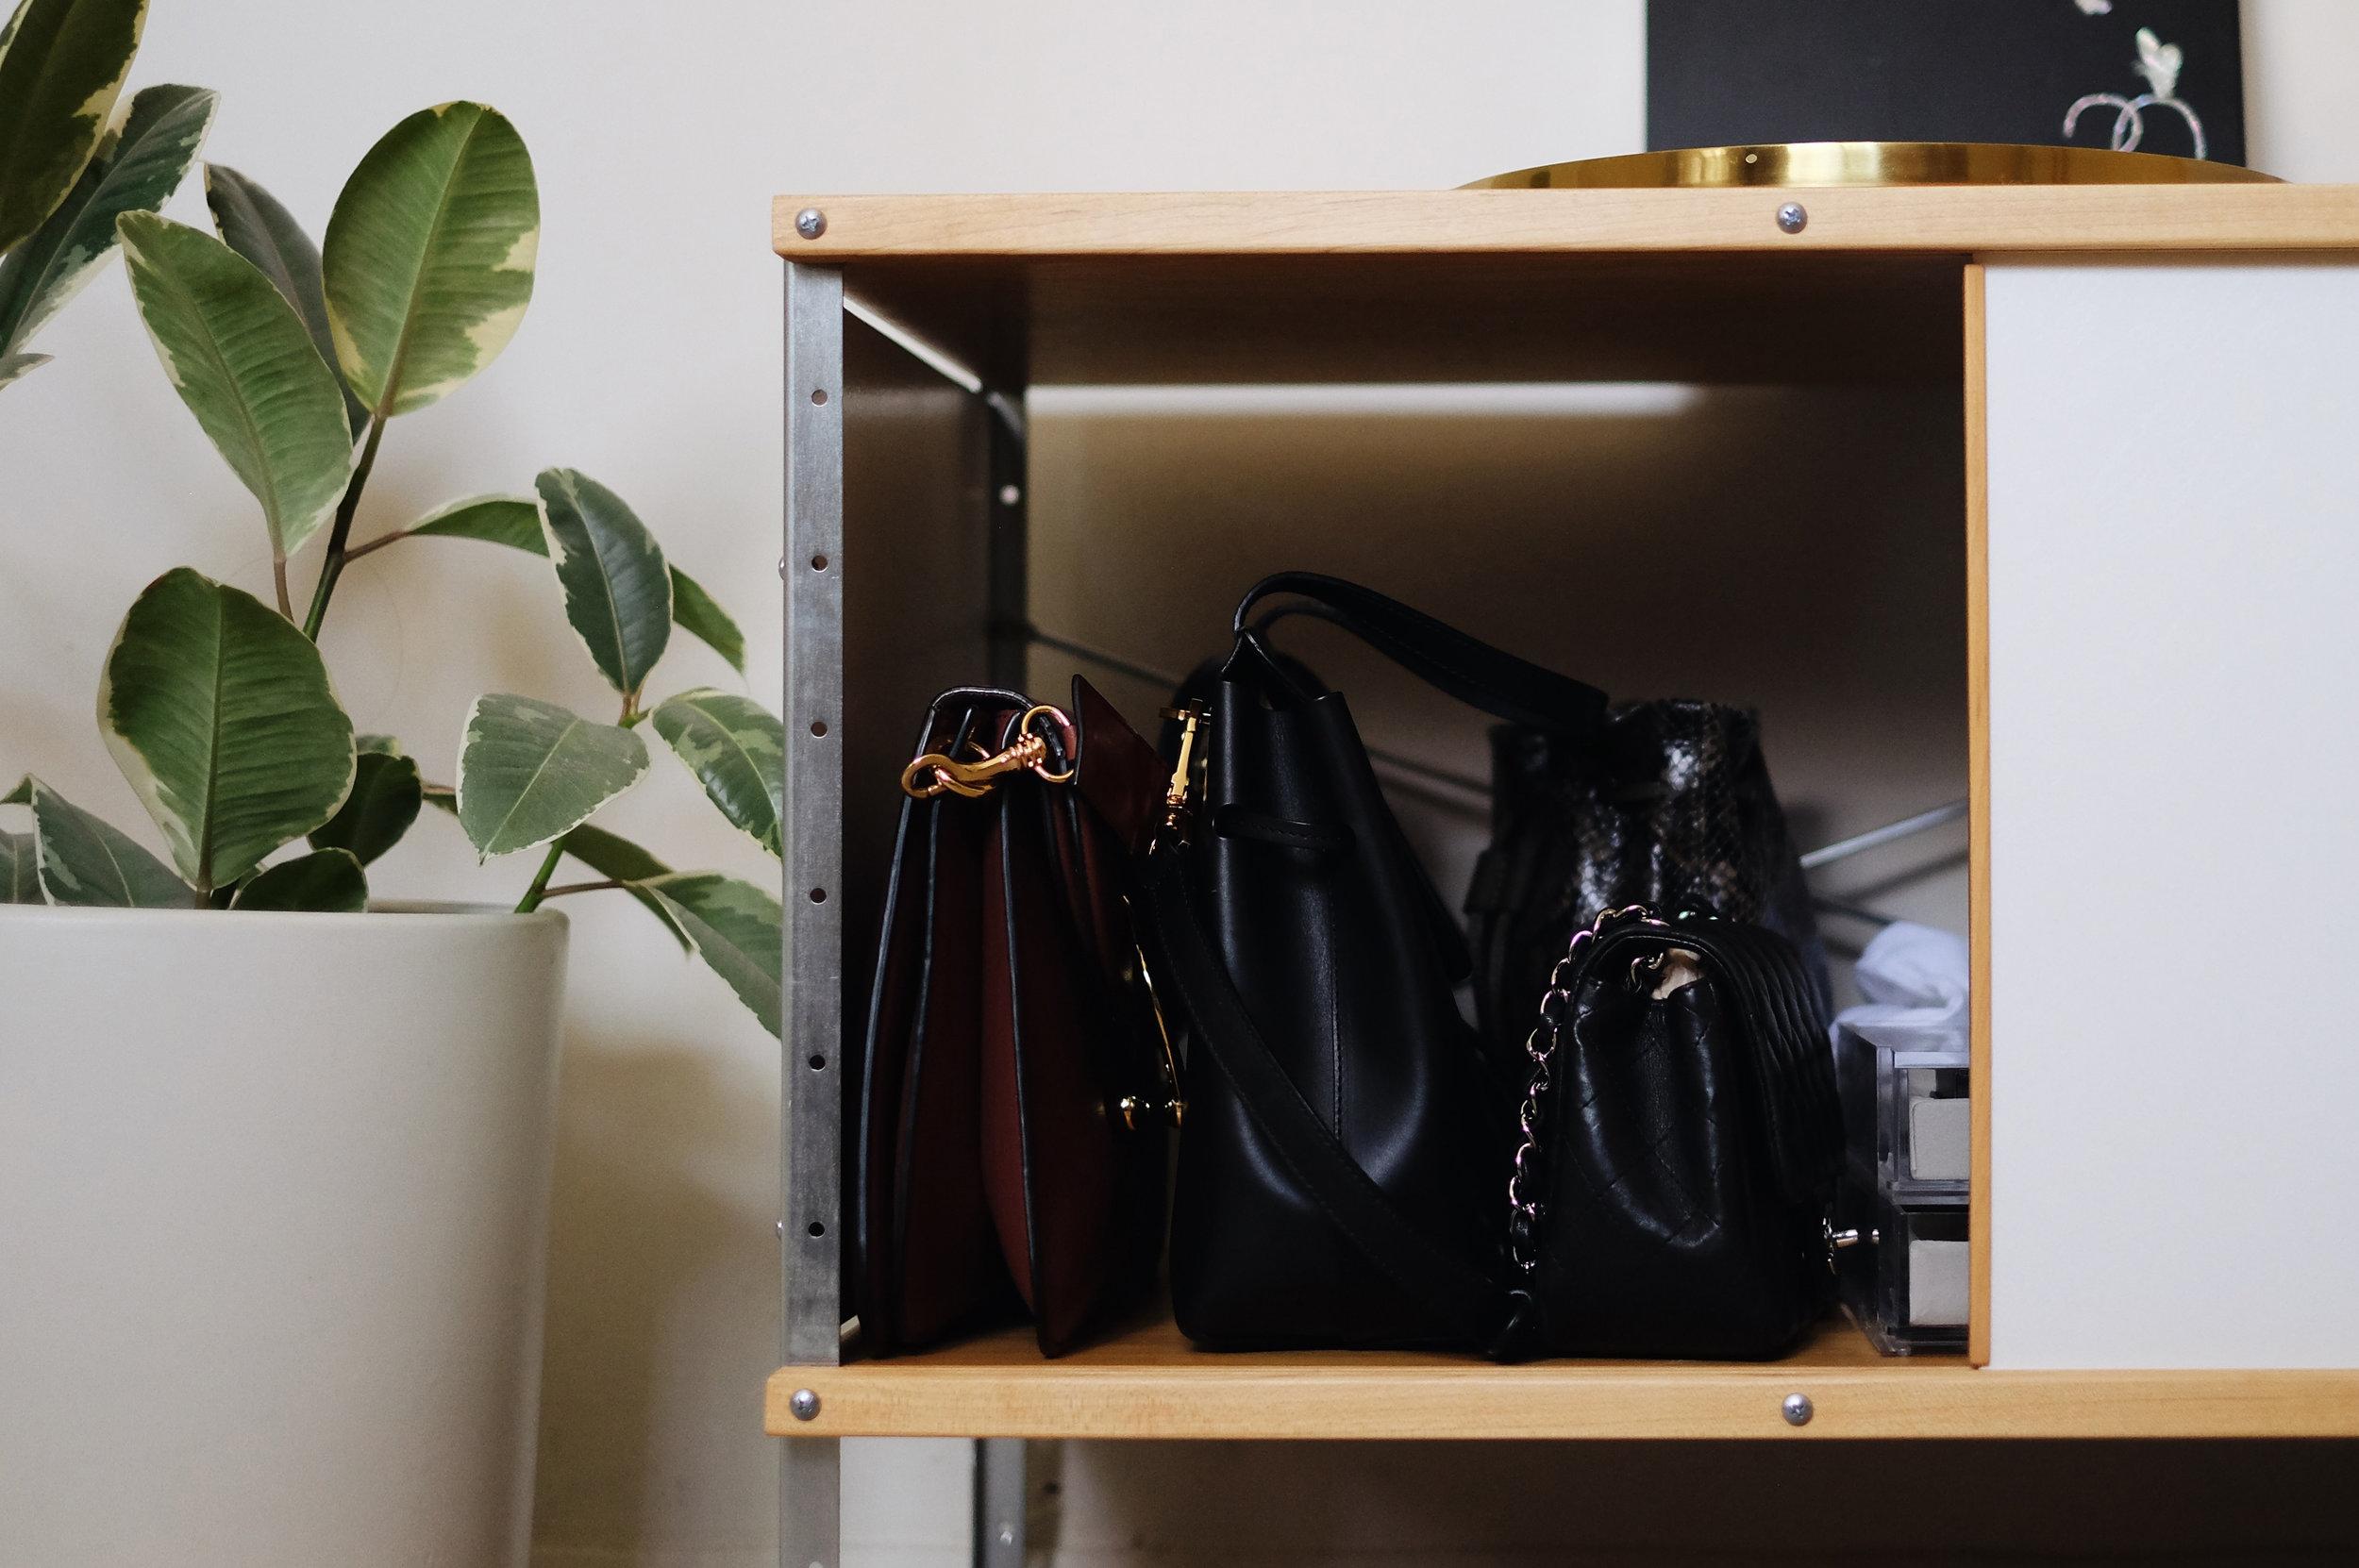 J.W.ANDERSON   Pierce Bag   / MANSUR GAVRIEL   Mini Lady Bag   / CHANEL Small Flap (  Similar here  )